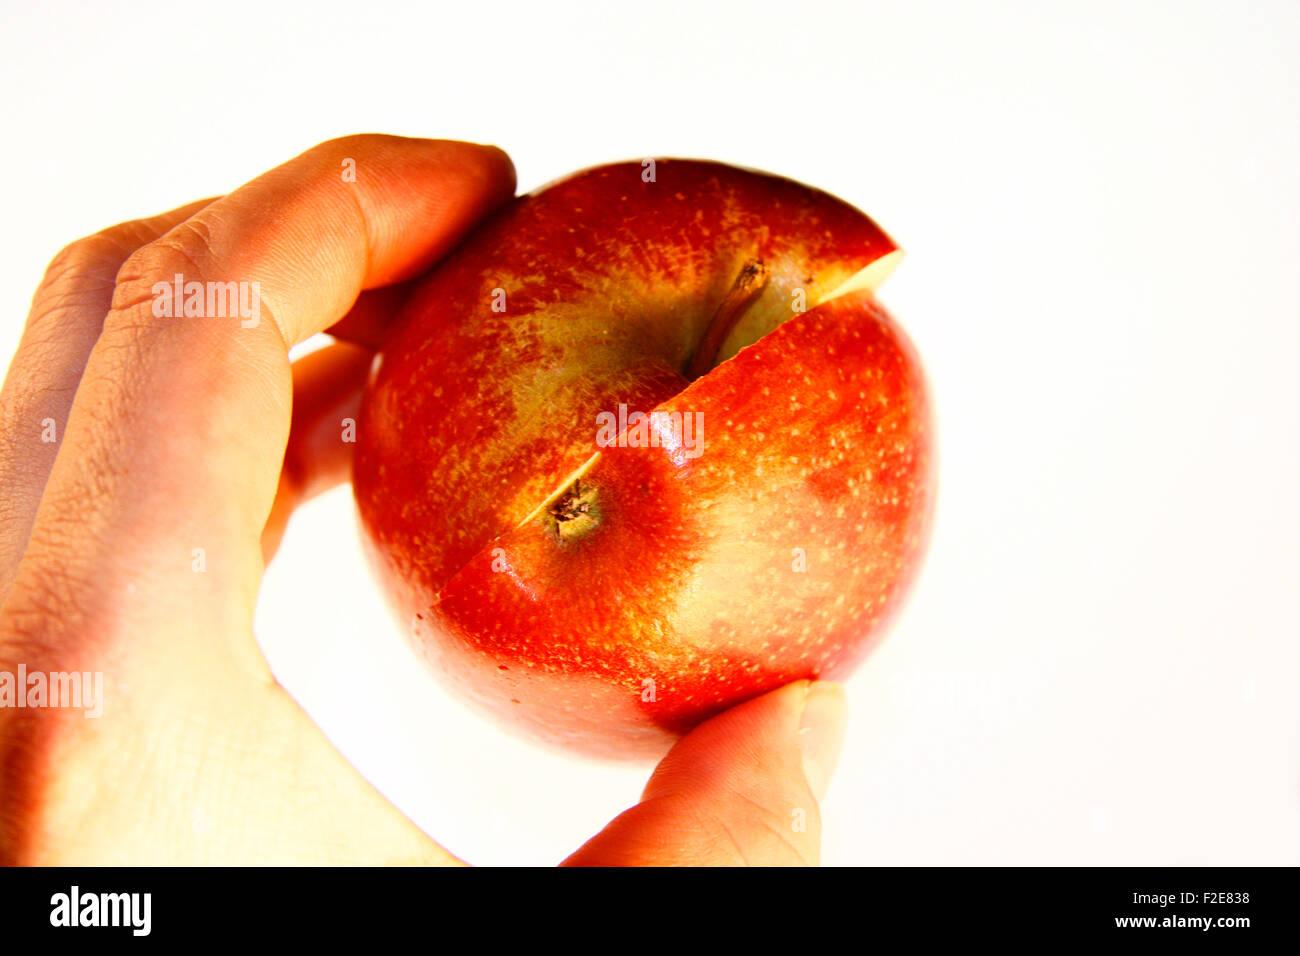 Apfel - Symbolbild Nahrungsmittel . Stock Photo